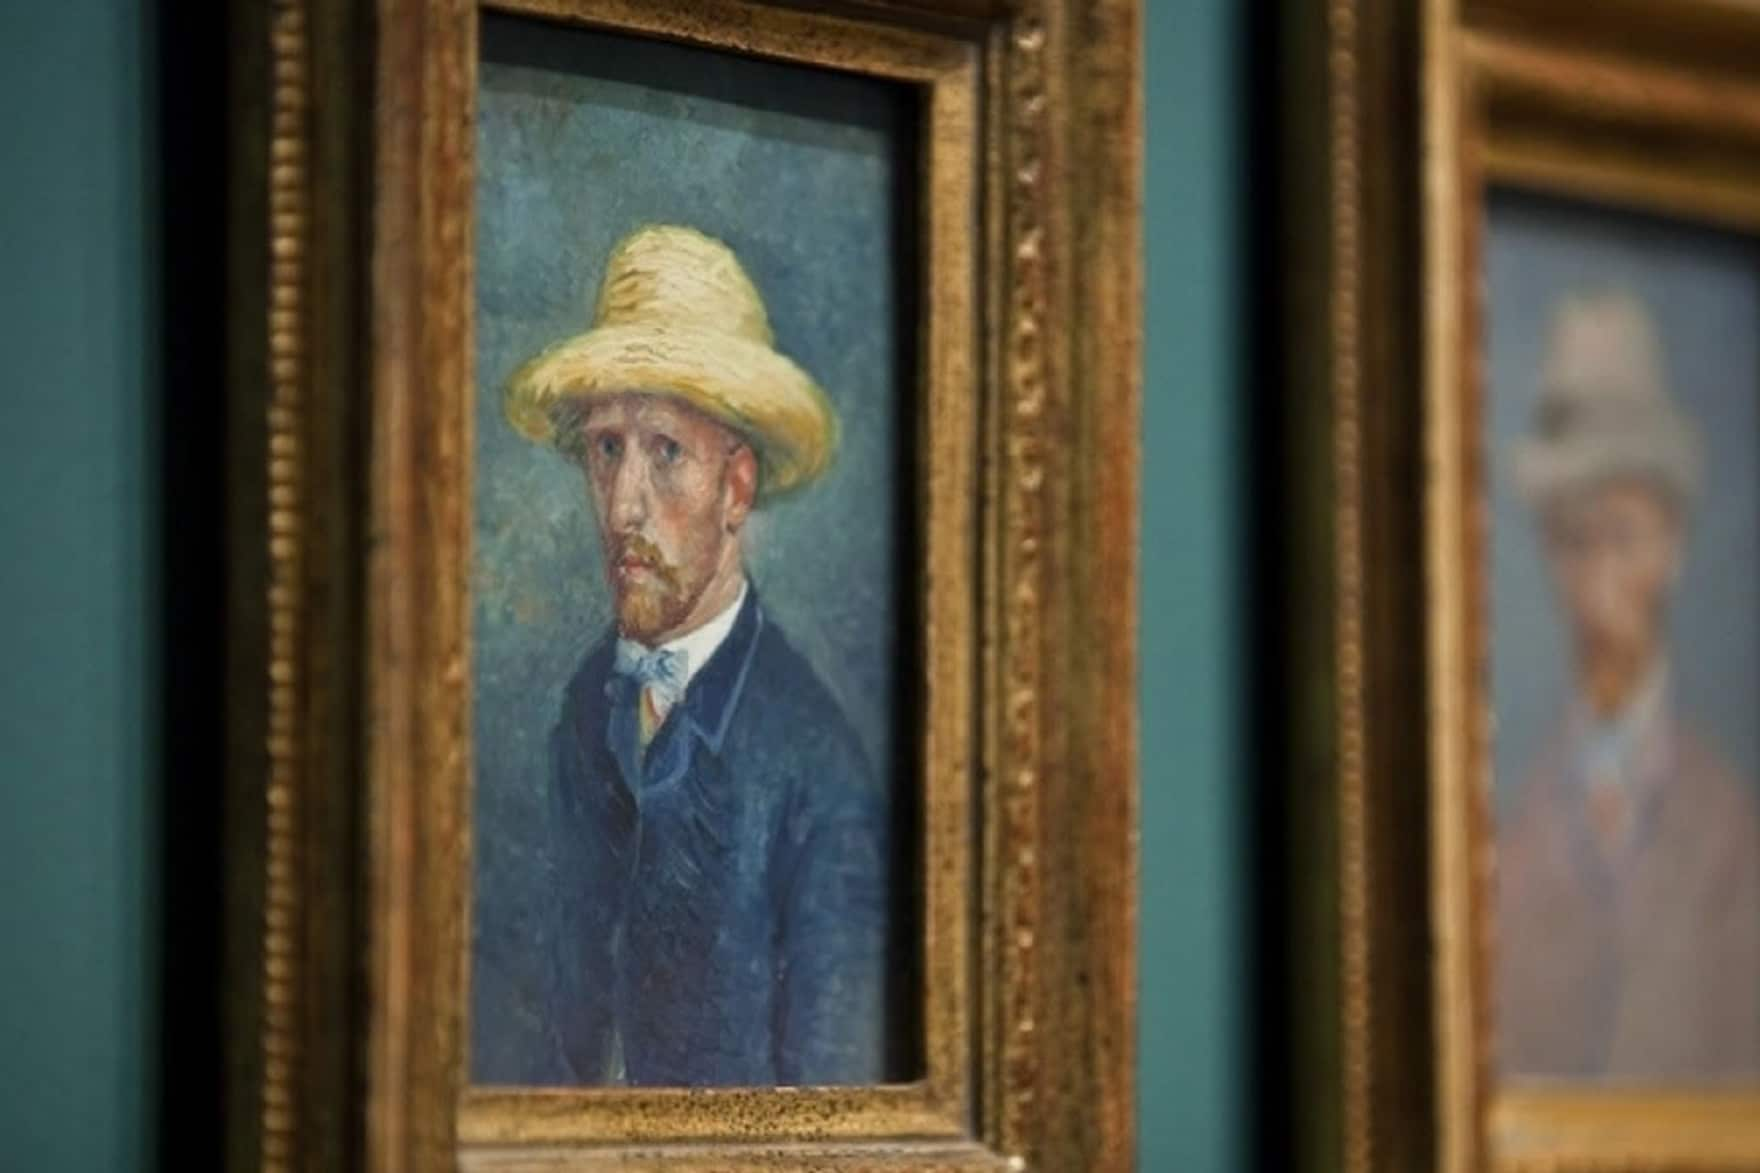 Experience Vincent van Gogh selfportait